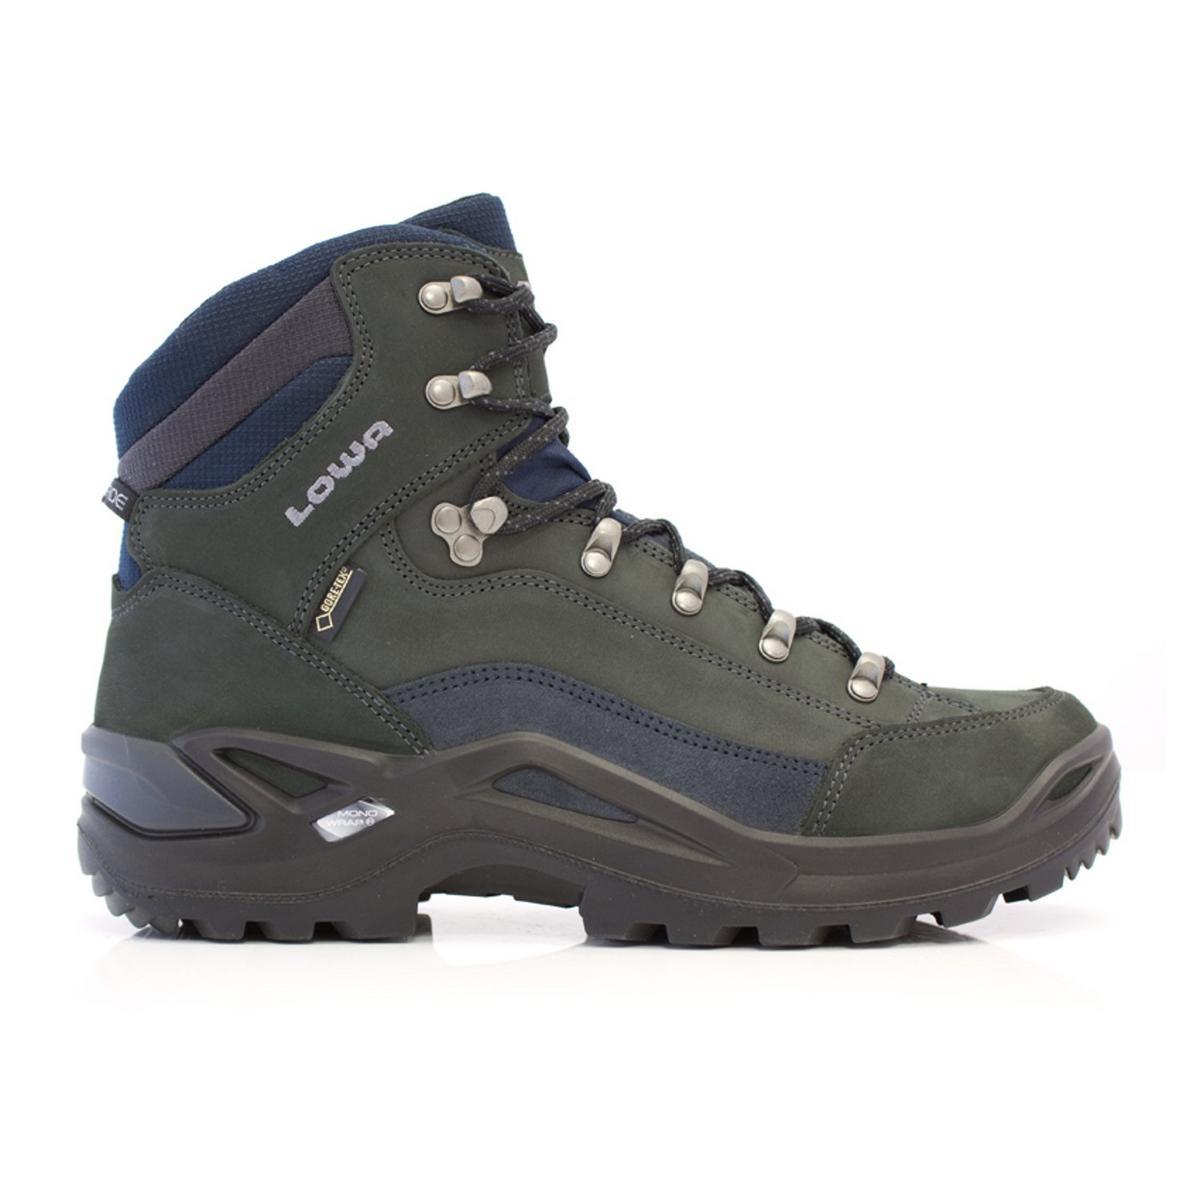 Lowa Men's Renegade Gore-Tex Mid Hiking Boot